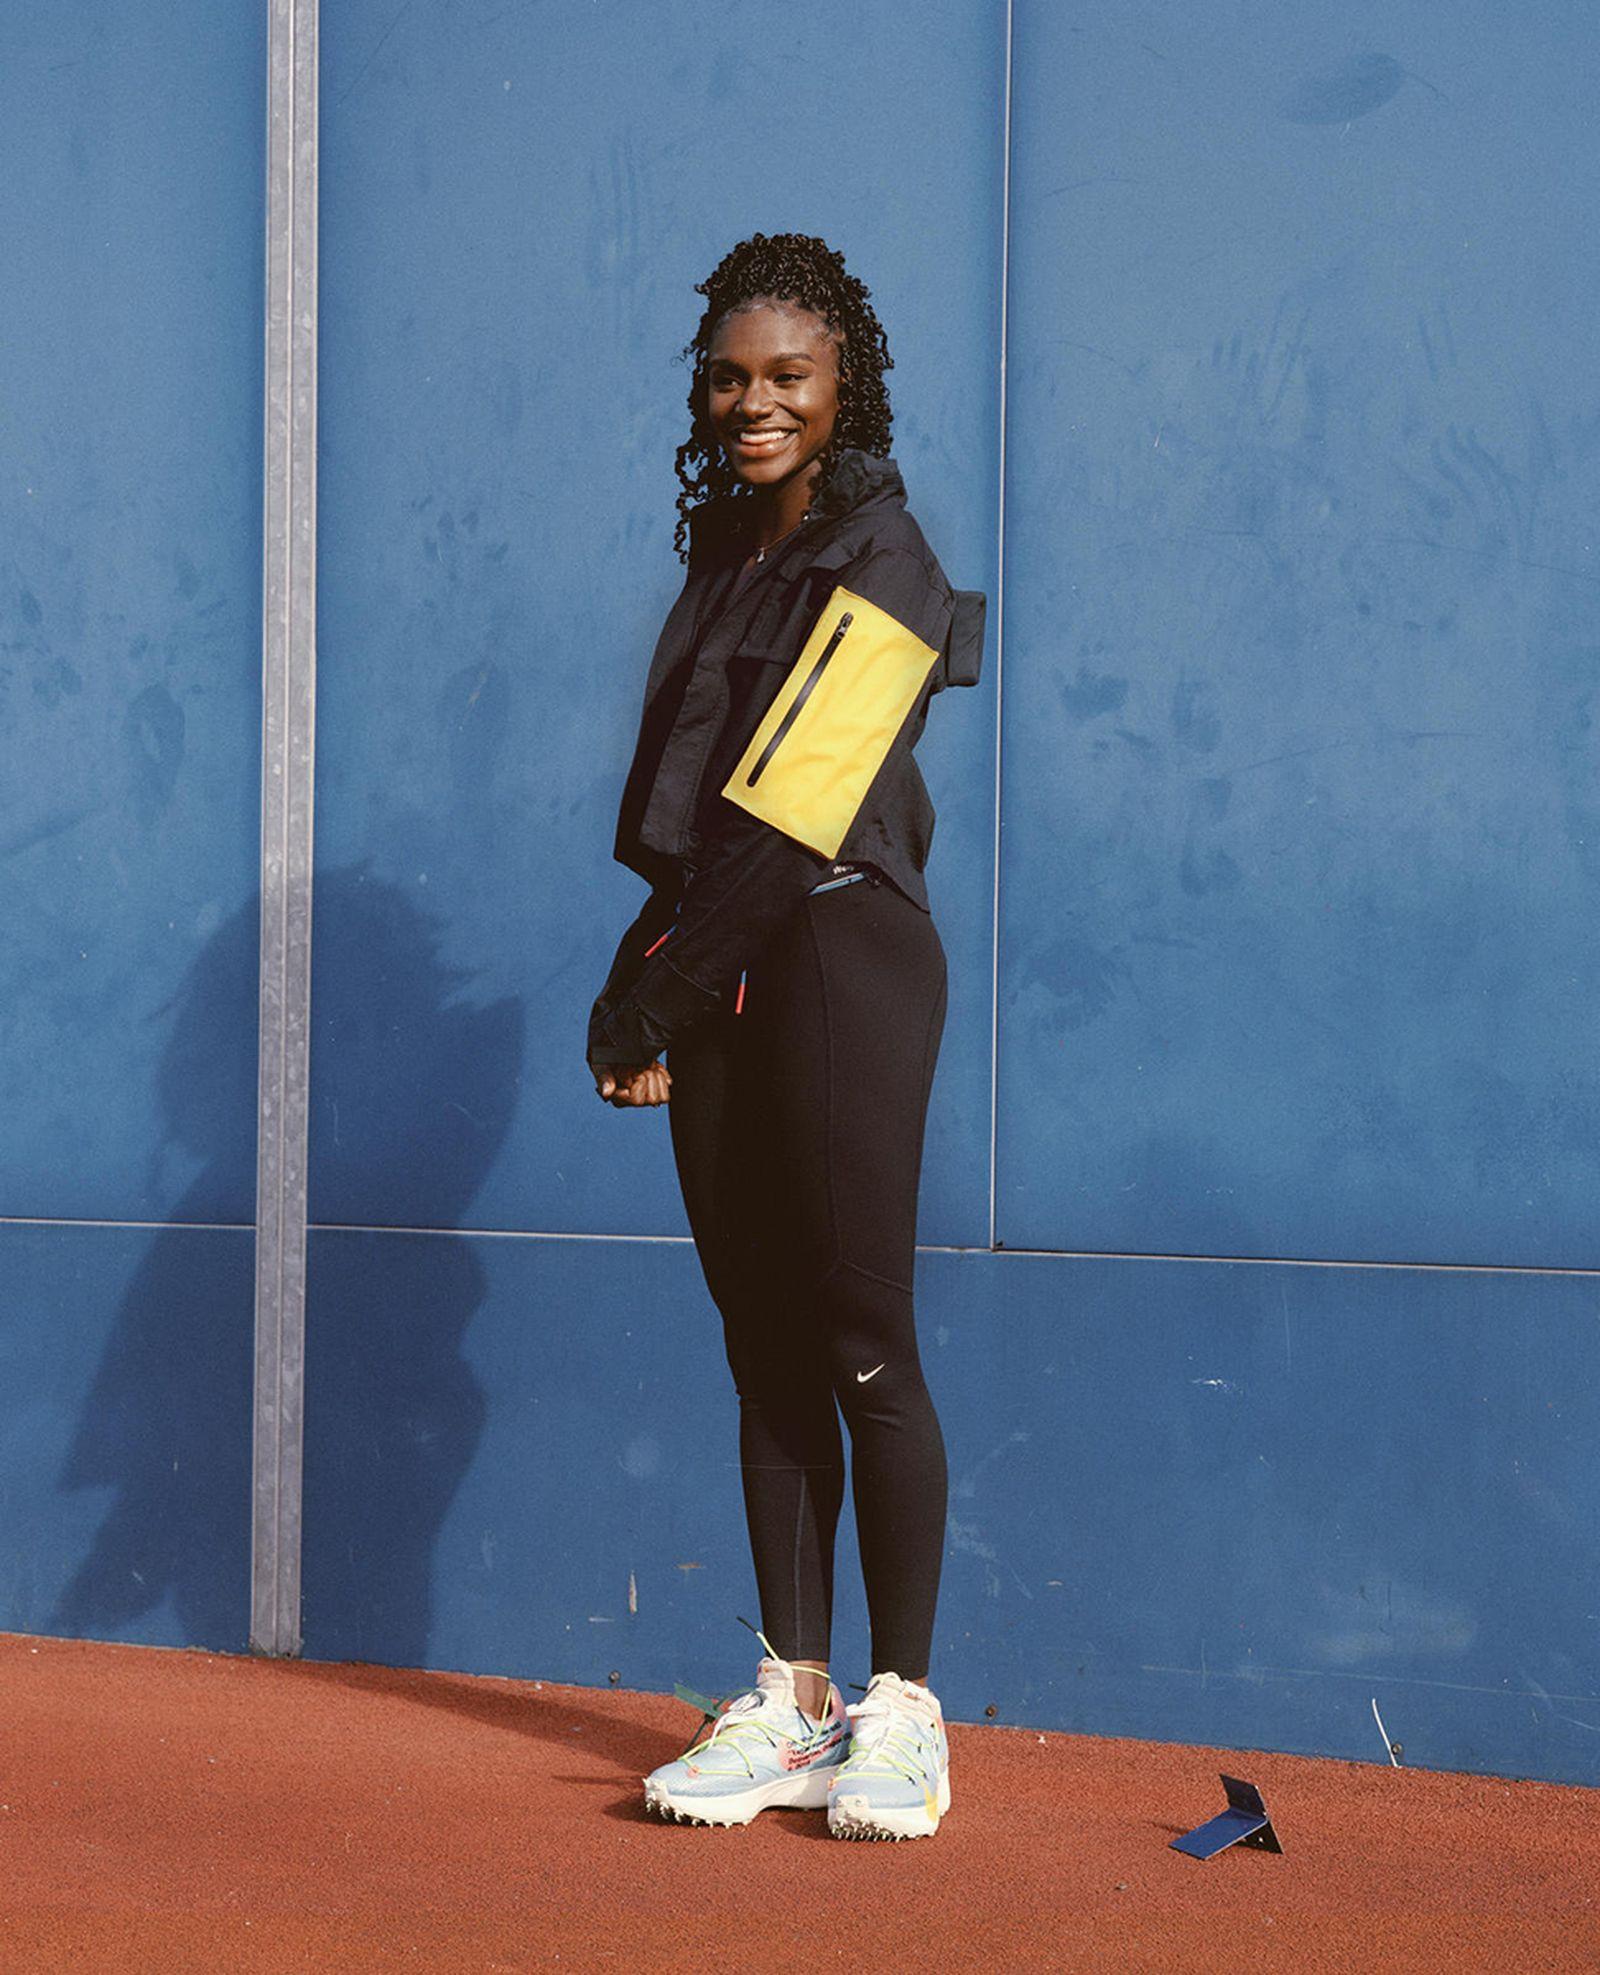 Virgil Abloh Nike Athlete in Progress collection